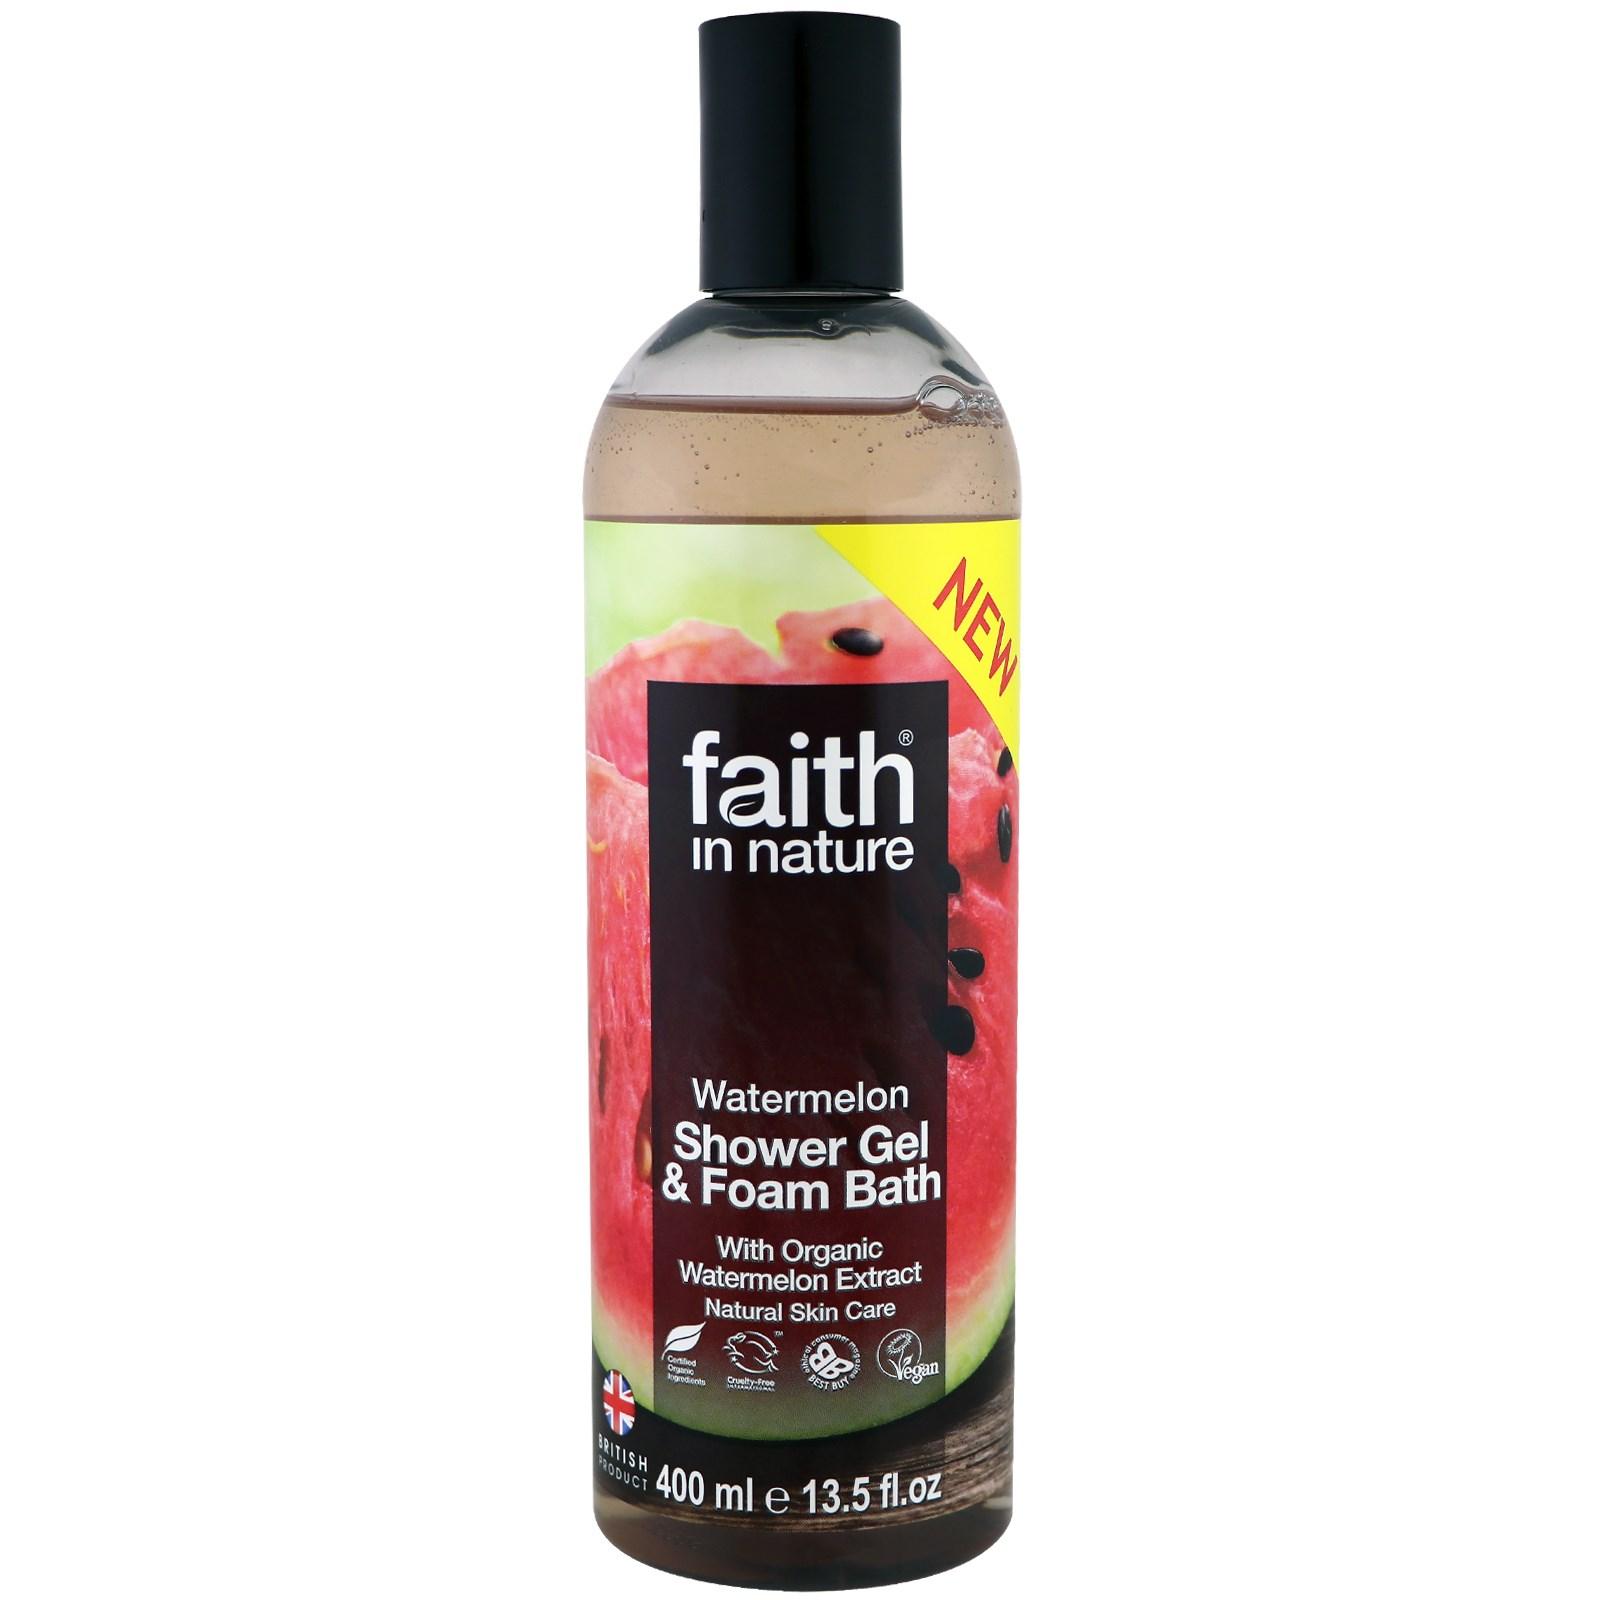 Faith in Nature, Shower Gel & Foam Bath, Watermelon, 13.5 fl oz (400 ml)